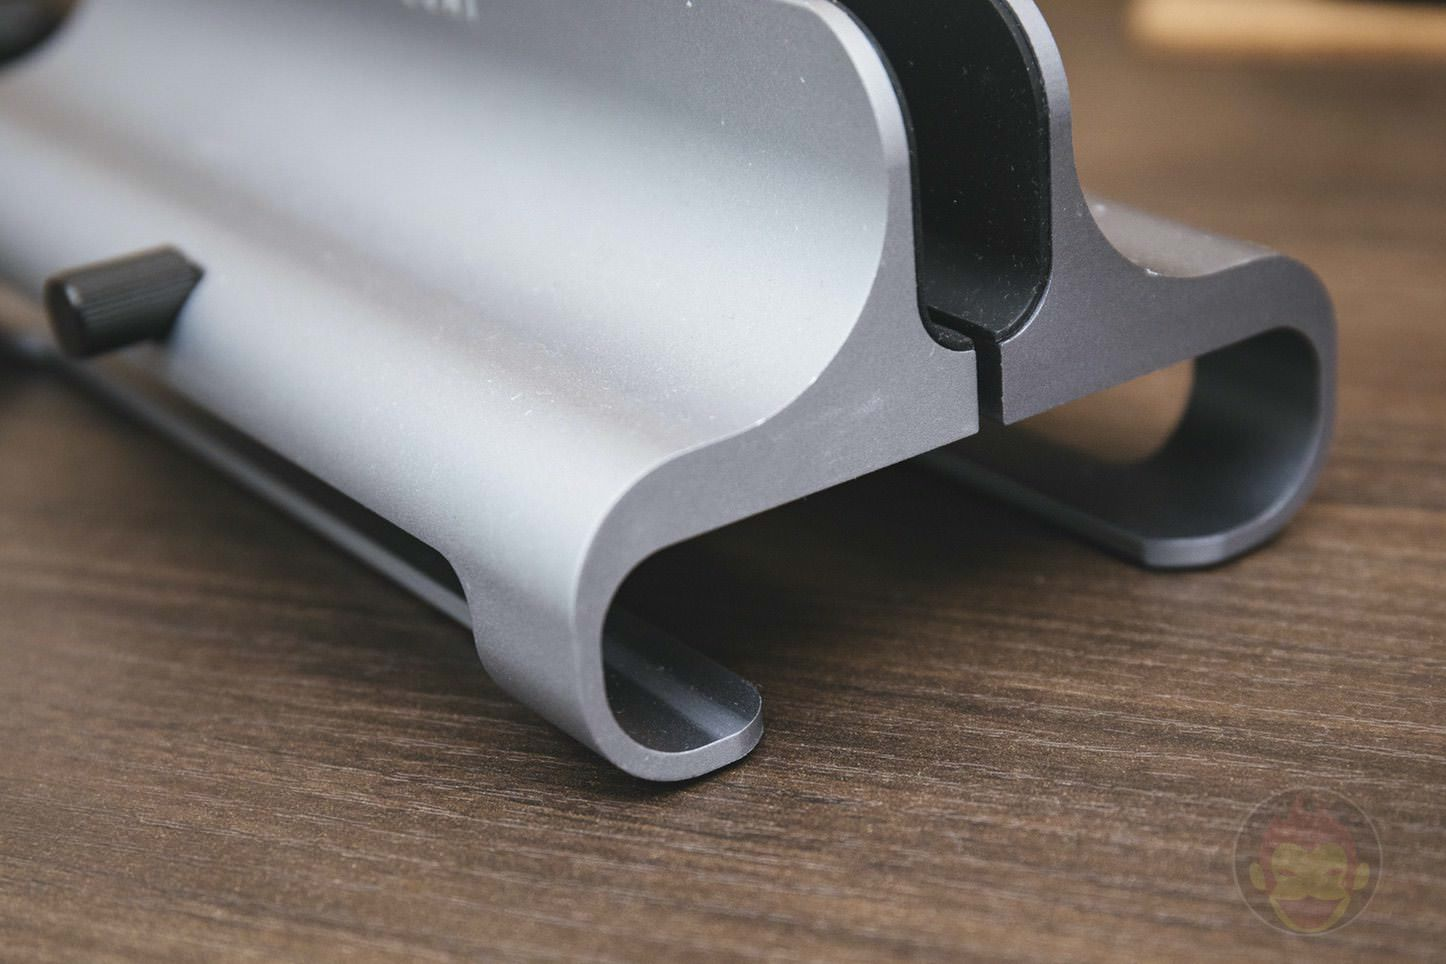 Satechi-Universal-Aluminum-Laptop-Stand-03.jpg